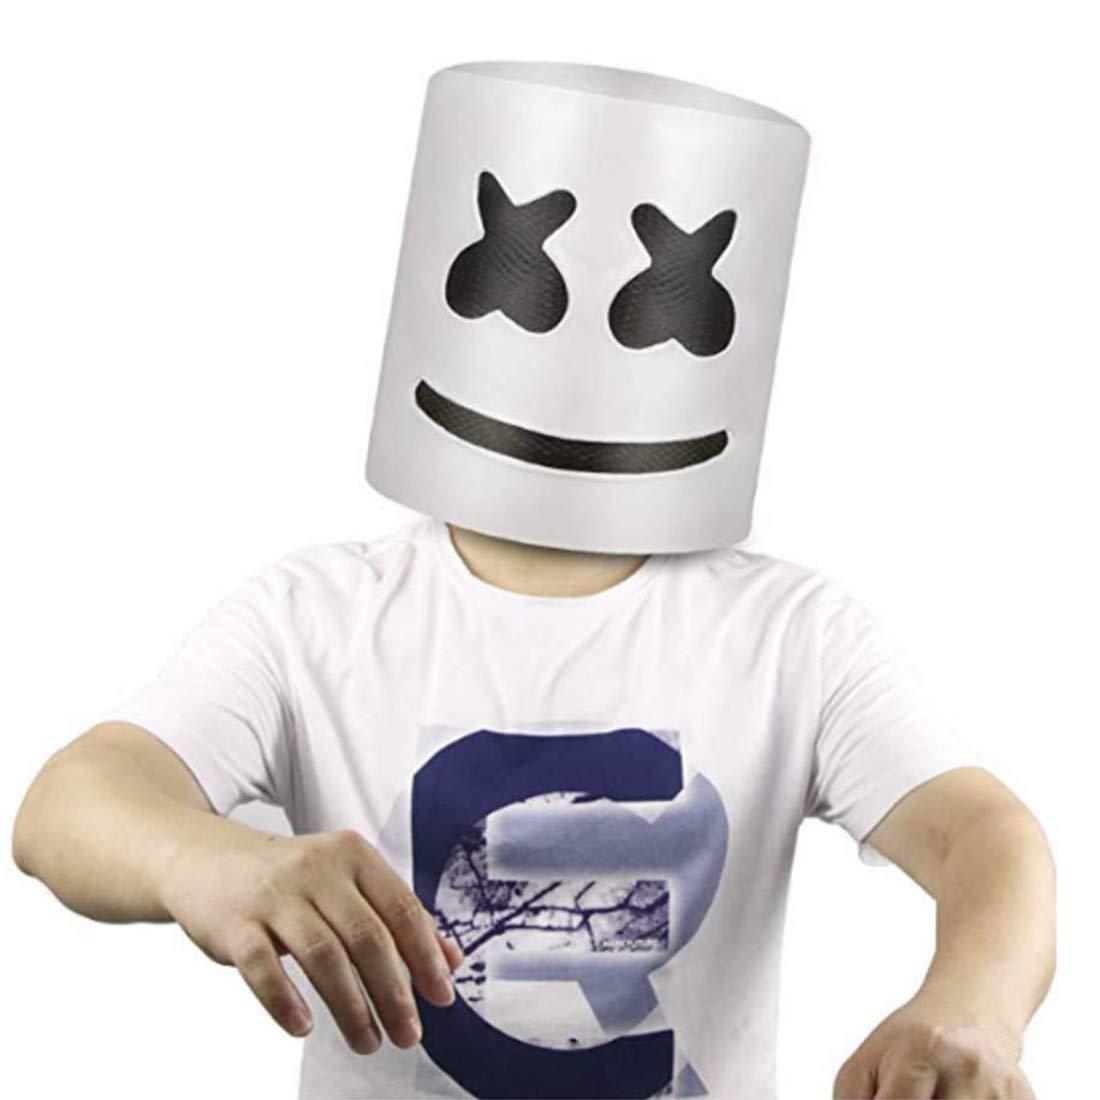 DJ Mask, Music Festival Helmets, Full Head Masks Halloween Party Props Costume Masks by Rednow